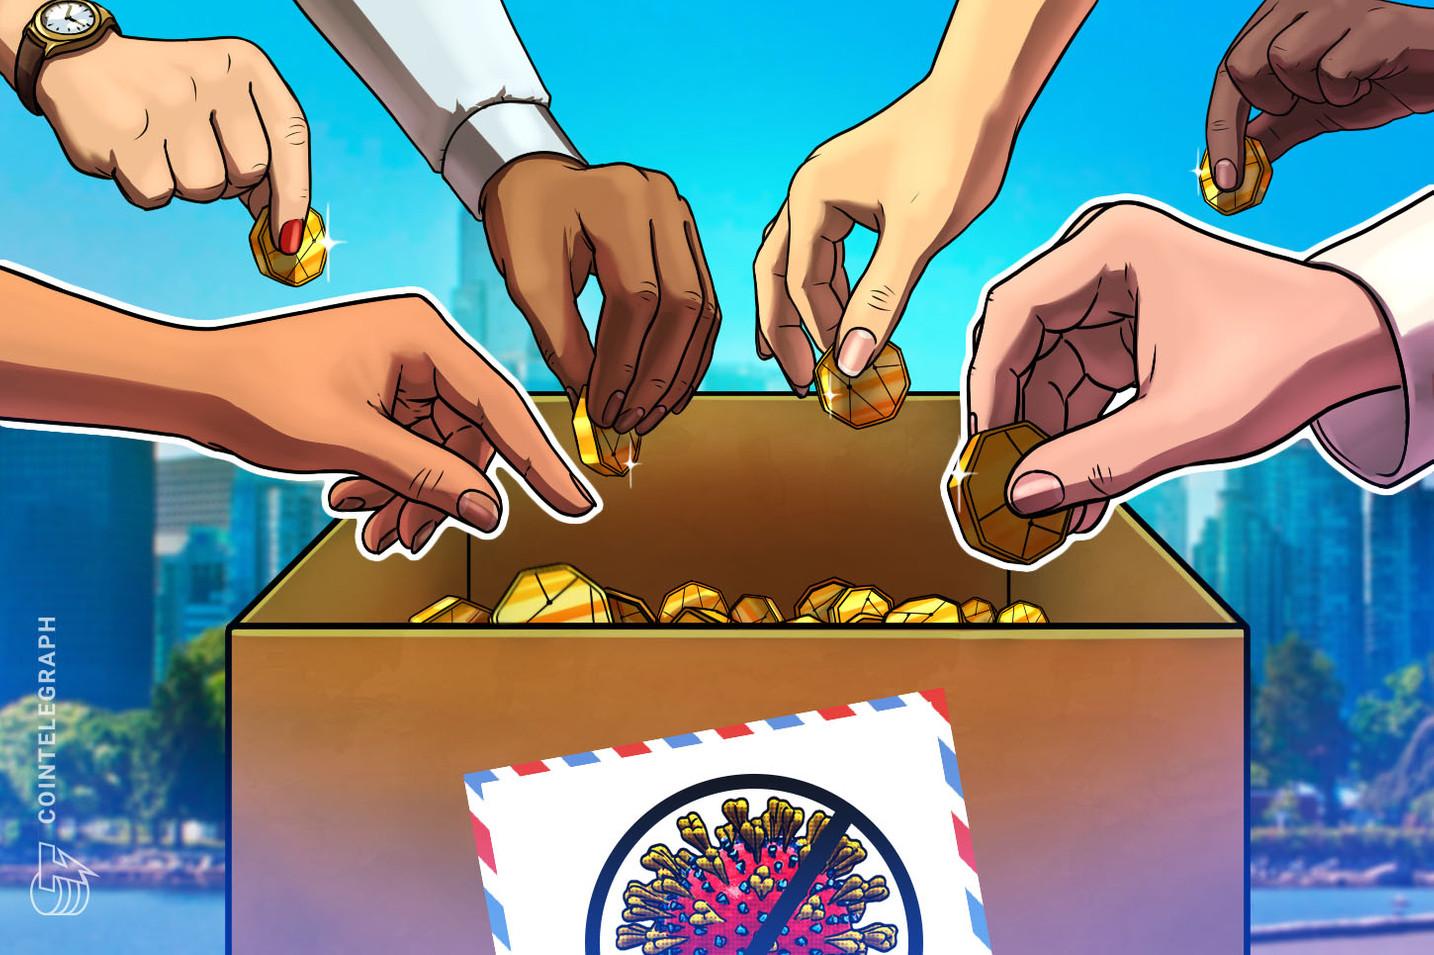 BitMEX: Beteiligung an Corona-Bekämpfung über eigenen Fonds